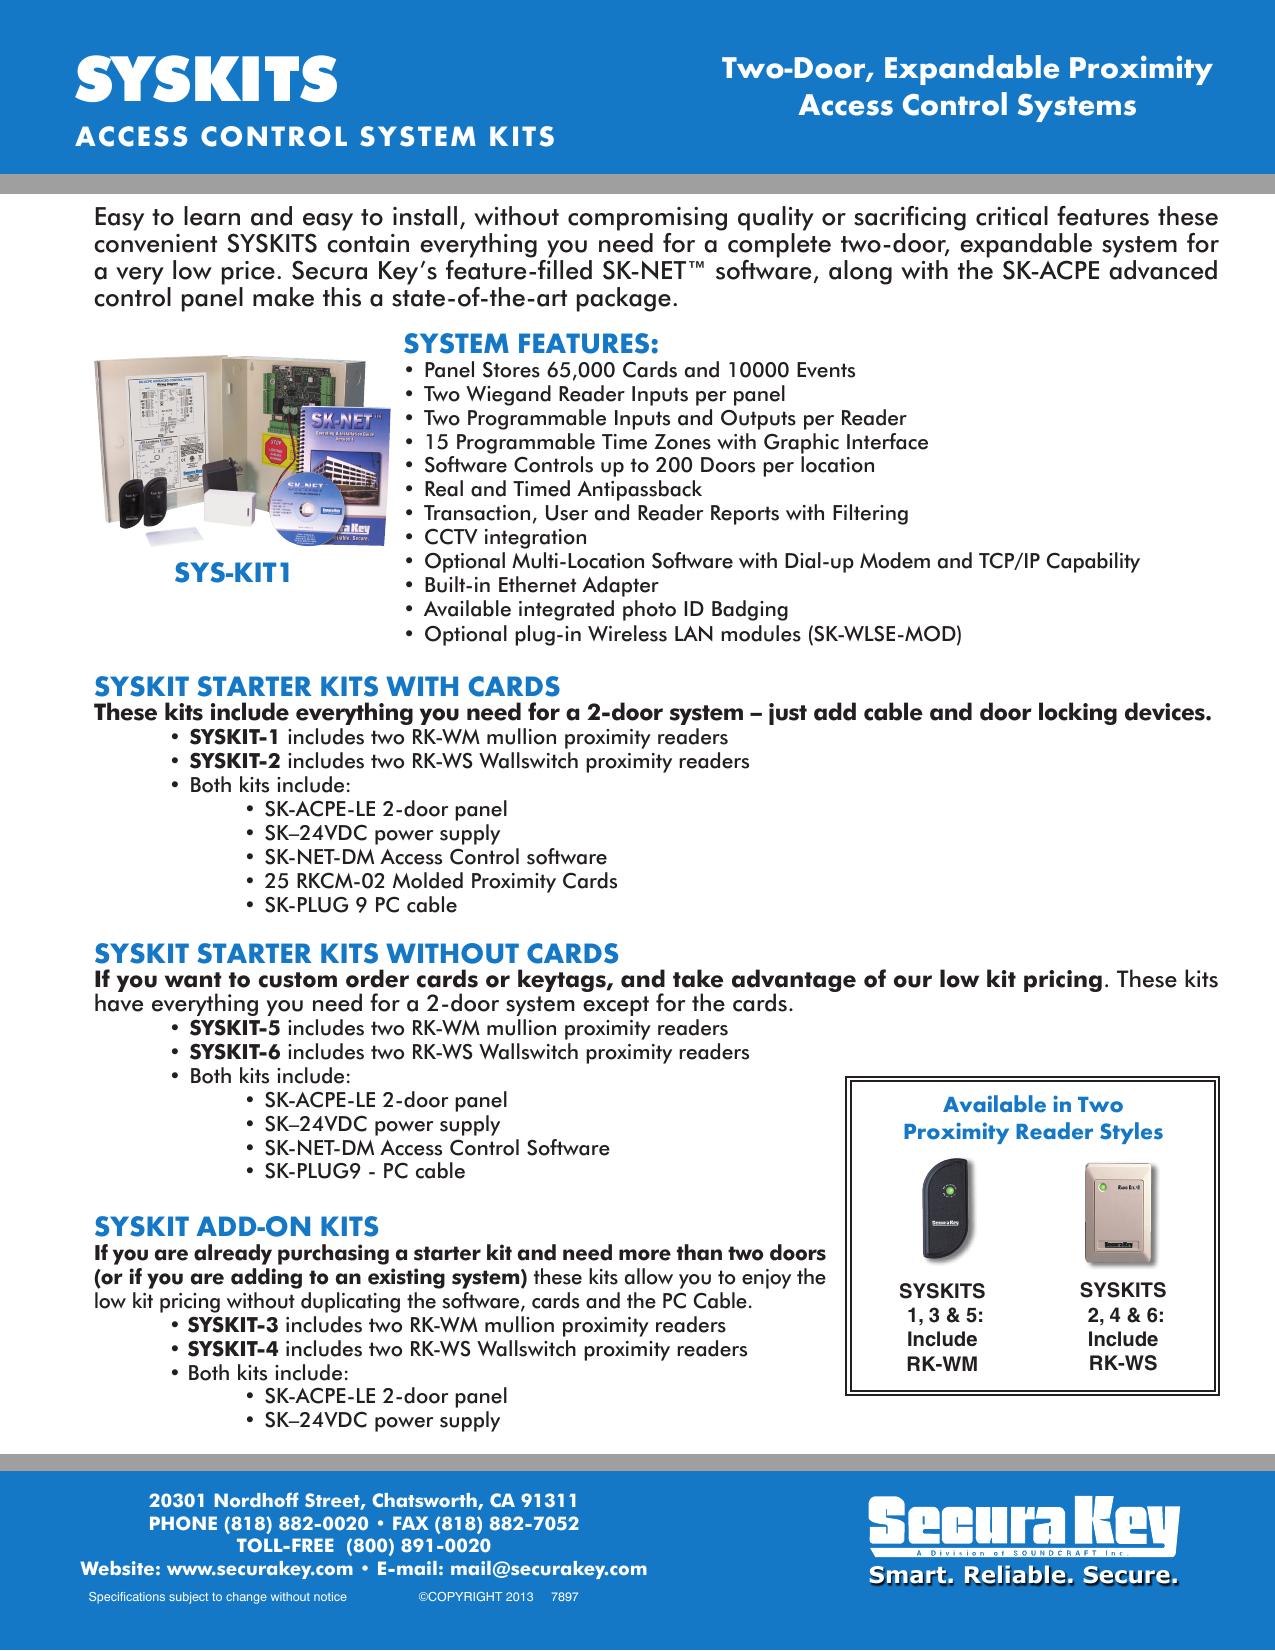 Syskit 6 Securakey Titan Engine Compartment Fuse Diagram 2012 Secura Key Wiring Syskits Manualzzcom 030240412 1 Fede606afd5a749c848e07459a745862